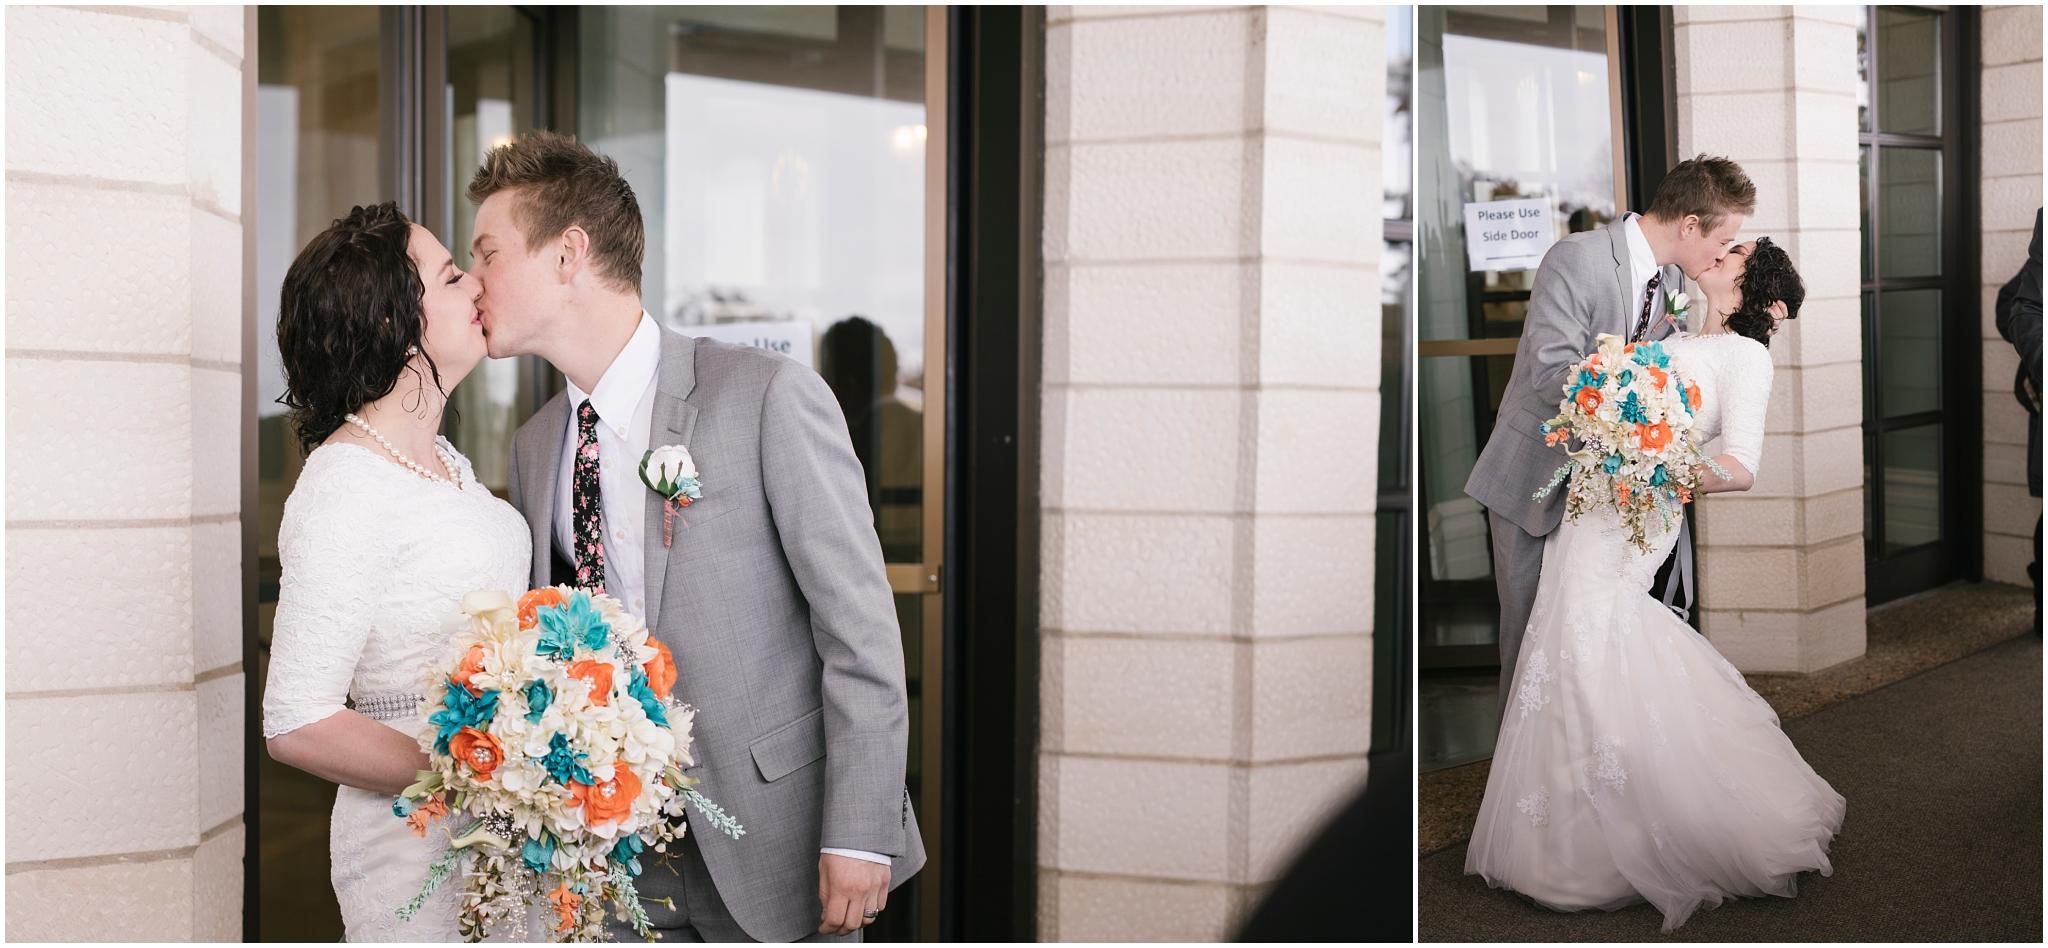 Bo Alyssa Wedding-53_Lizzie-B-Imagery-Utah-Wedding-Photographer-Central-Utah-Photographer-Utah-County-Manti-Temple.jpg